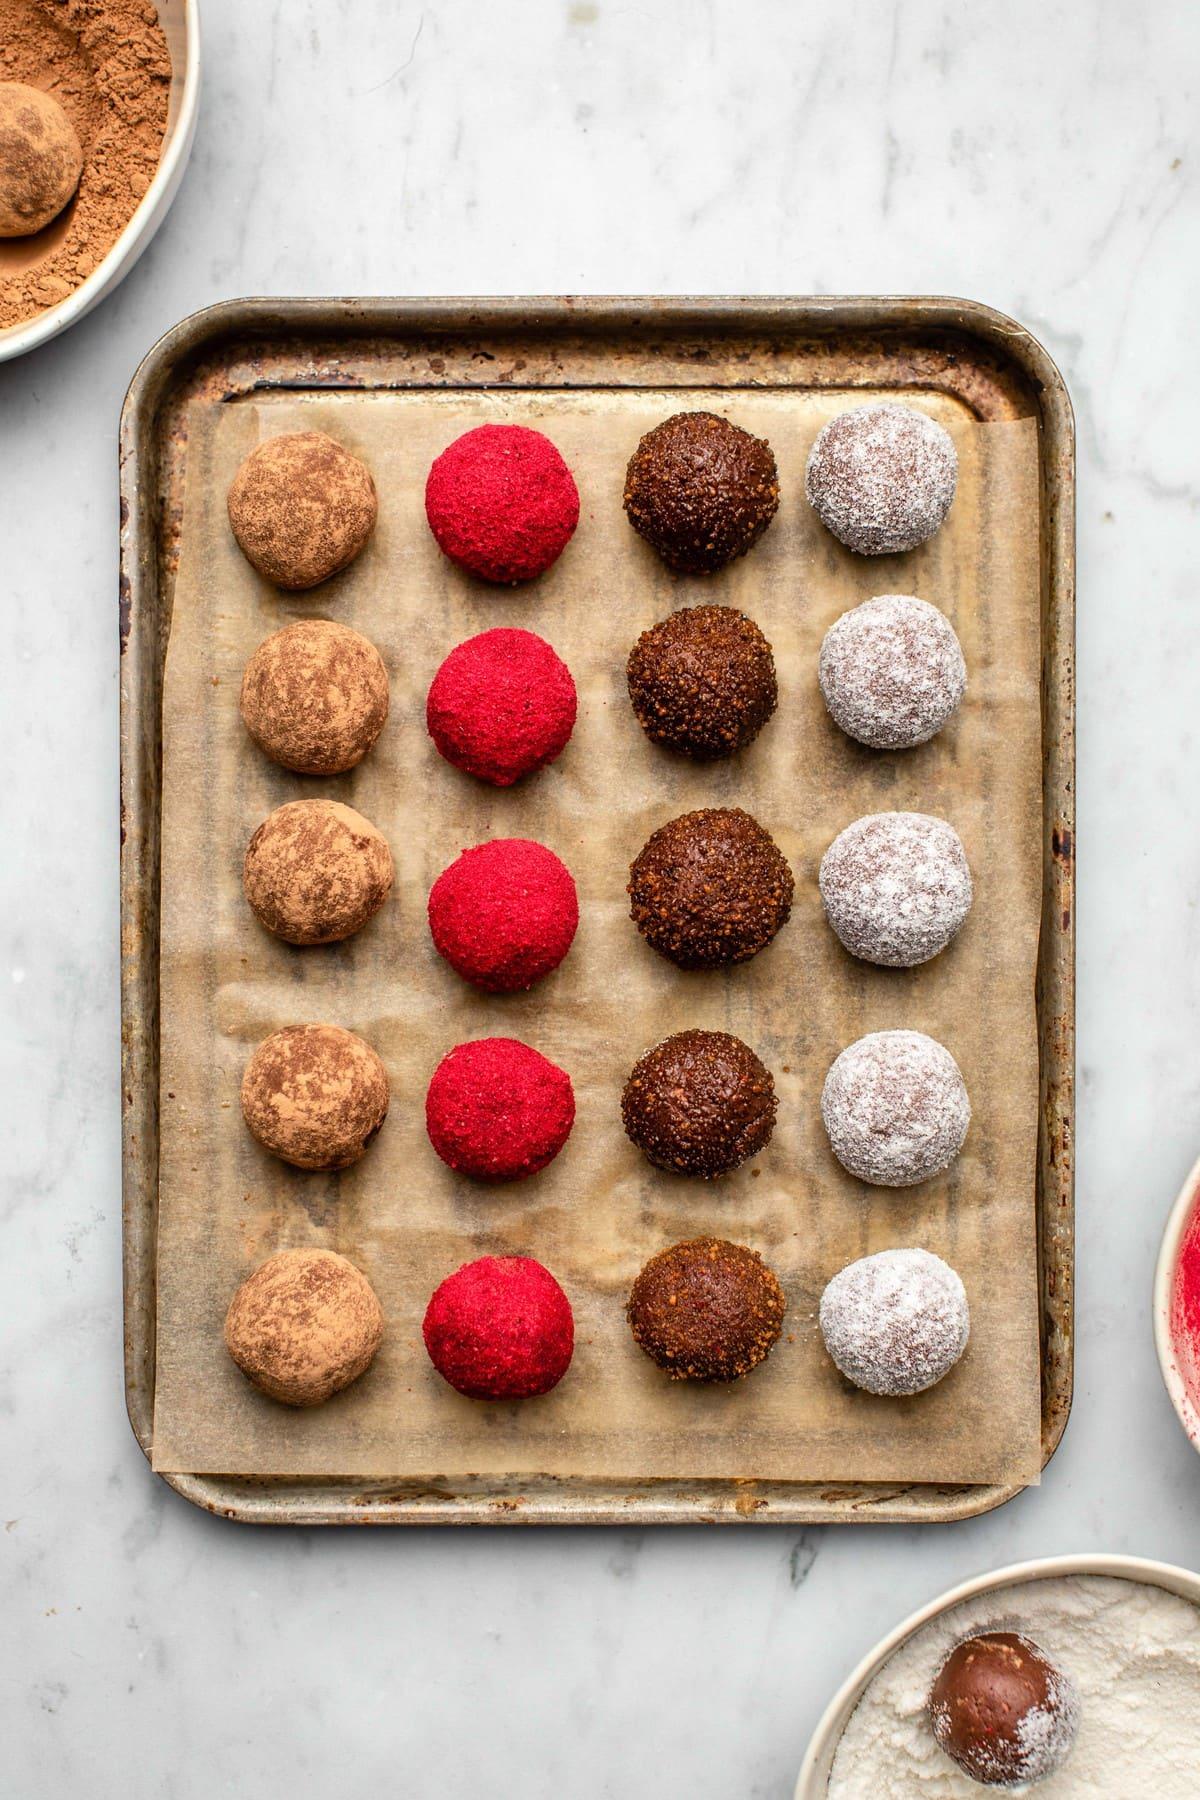 vegan chocolate truffles coated in cacao powder, raspberry powder, coconut sugar, and coconut milk powder on lined baking tray